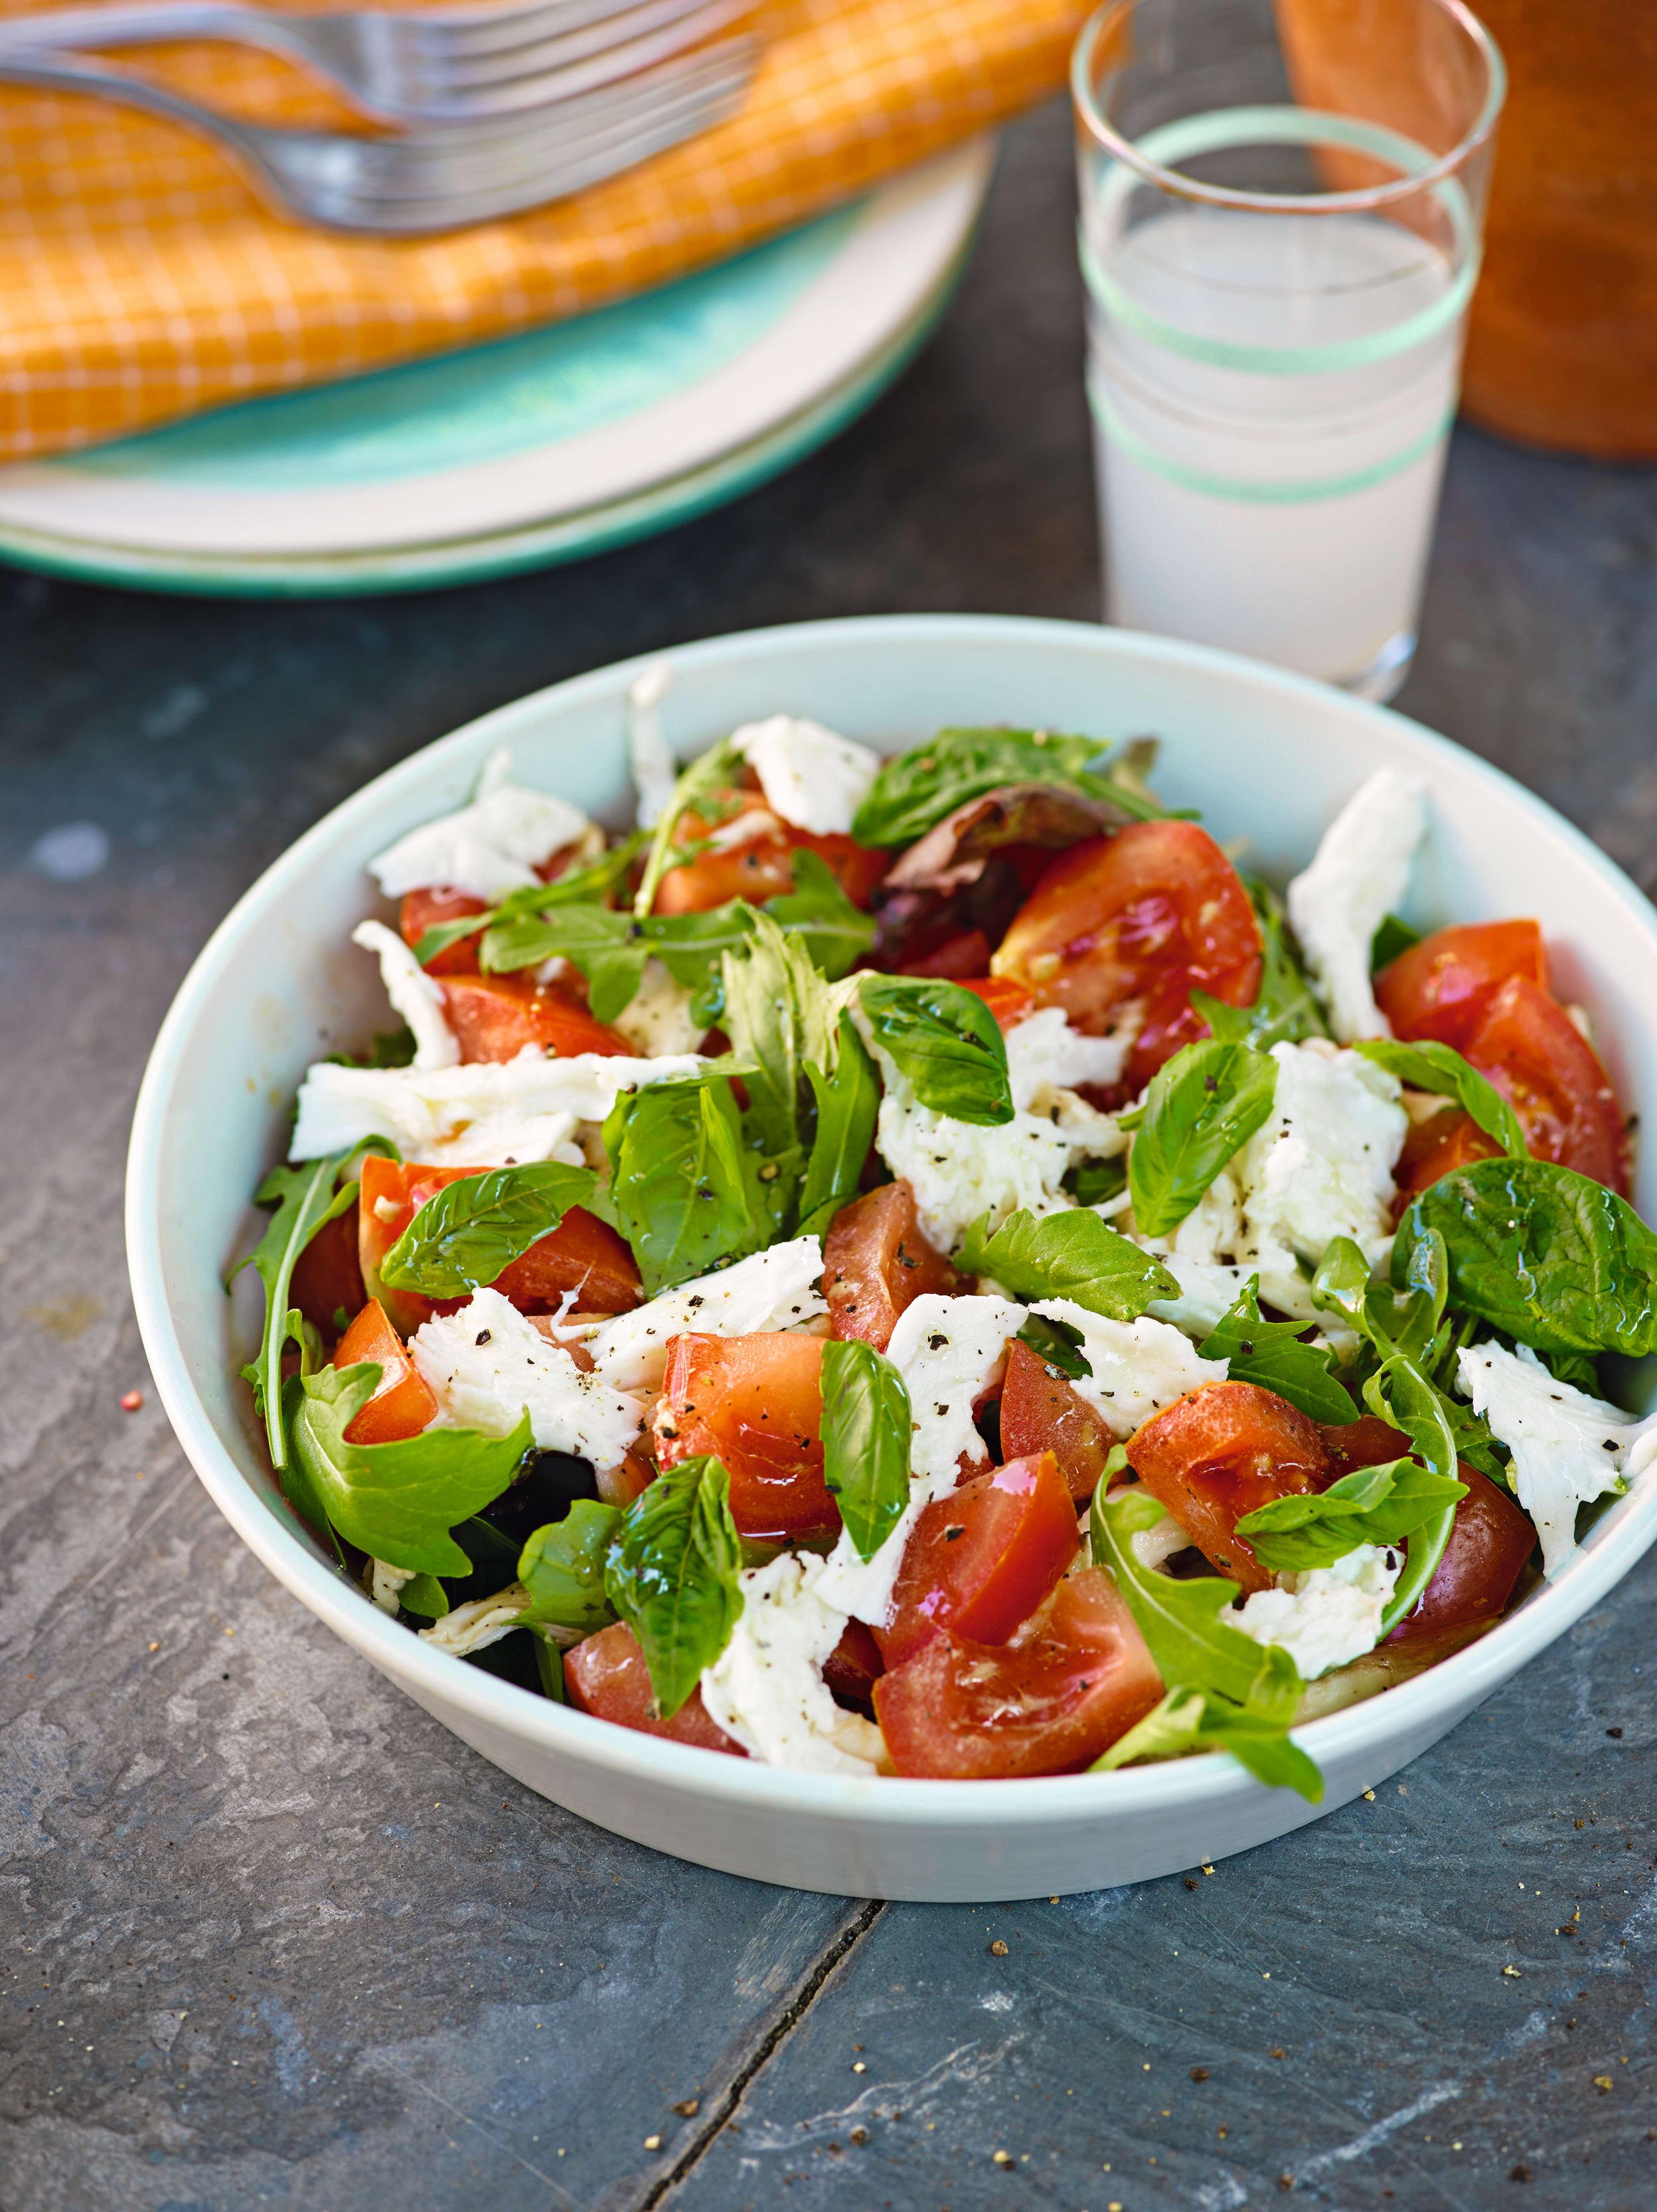 Photo of Basil, mozzarella and tomato salad by WW